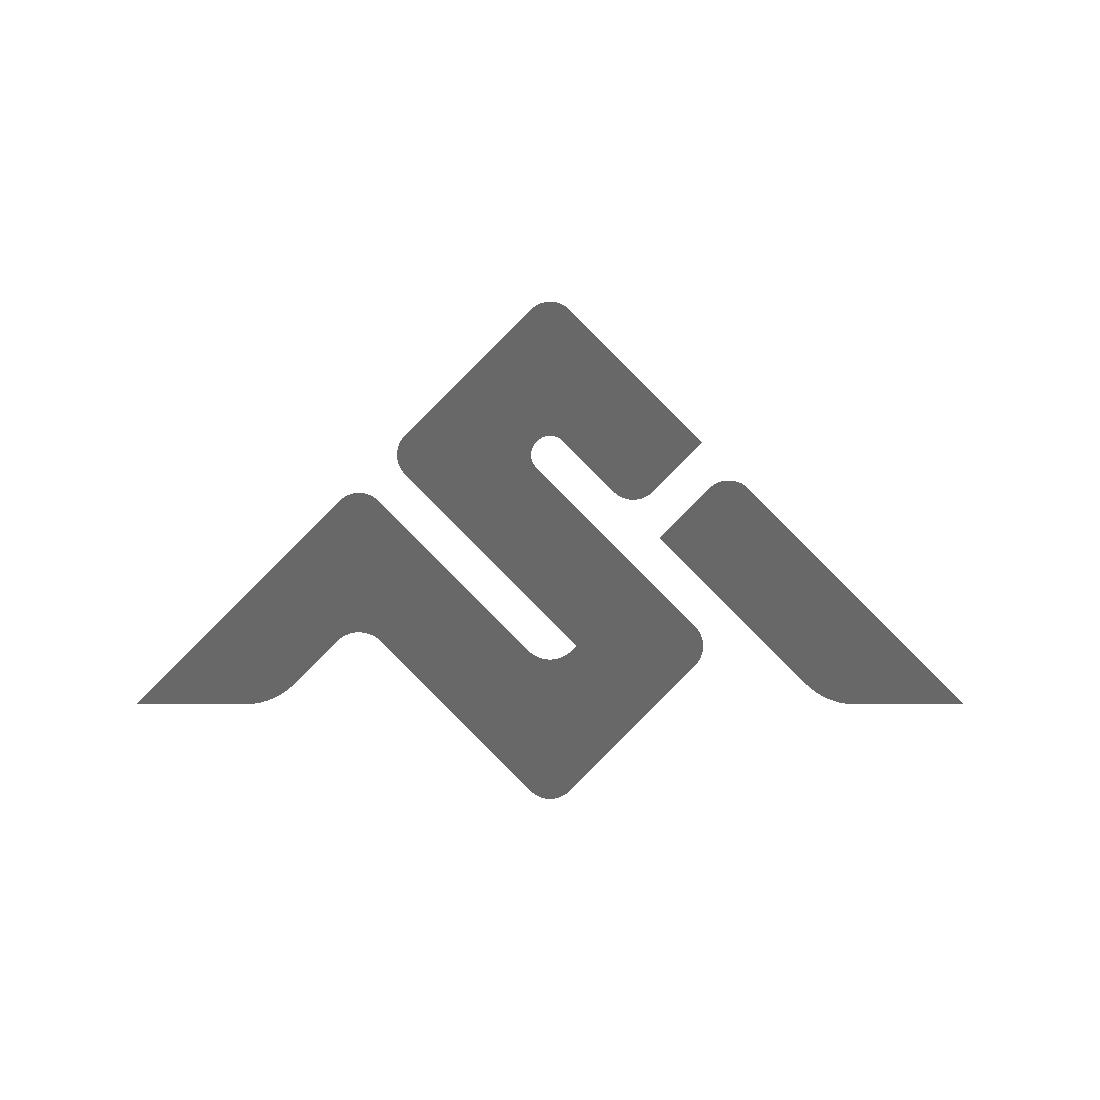 e7dafce1559b03 W Shop Nexo BlancheAchat Chaussure Femme 80 Ski Lyt De Head TFuKJ3l1c